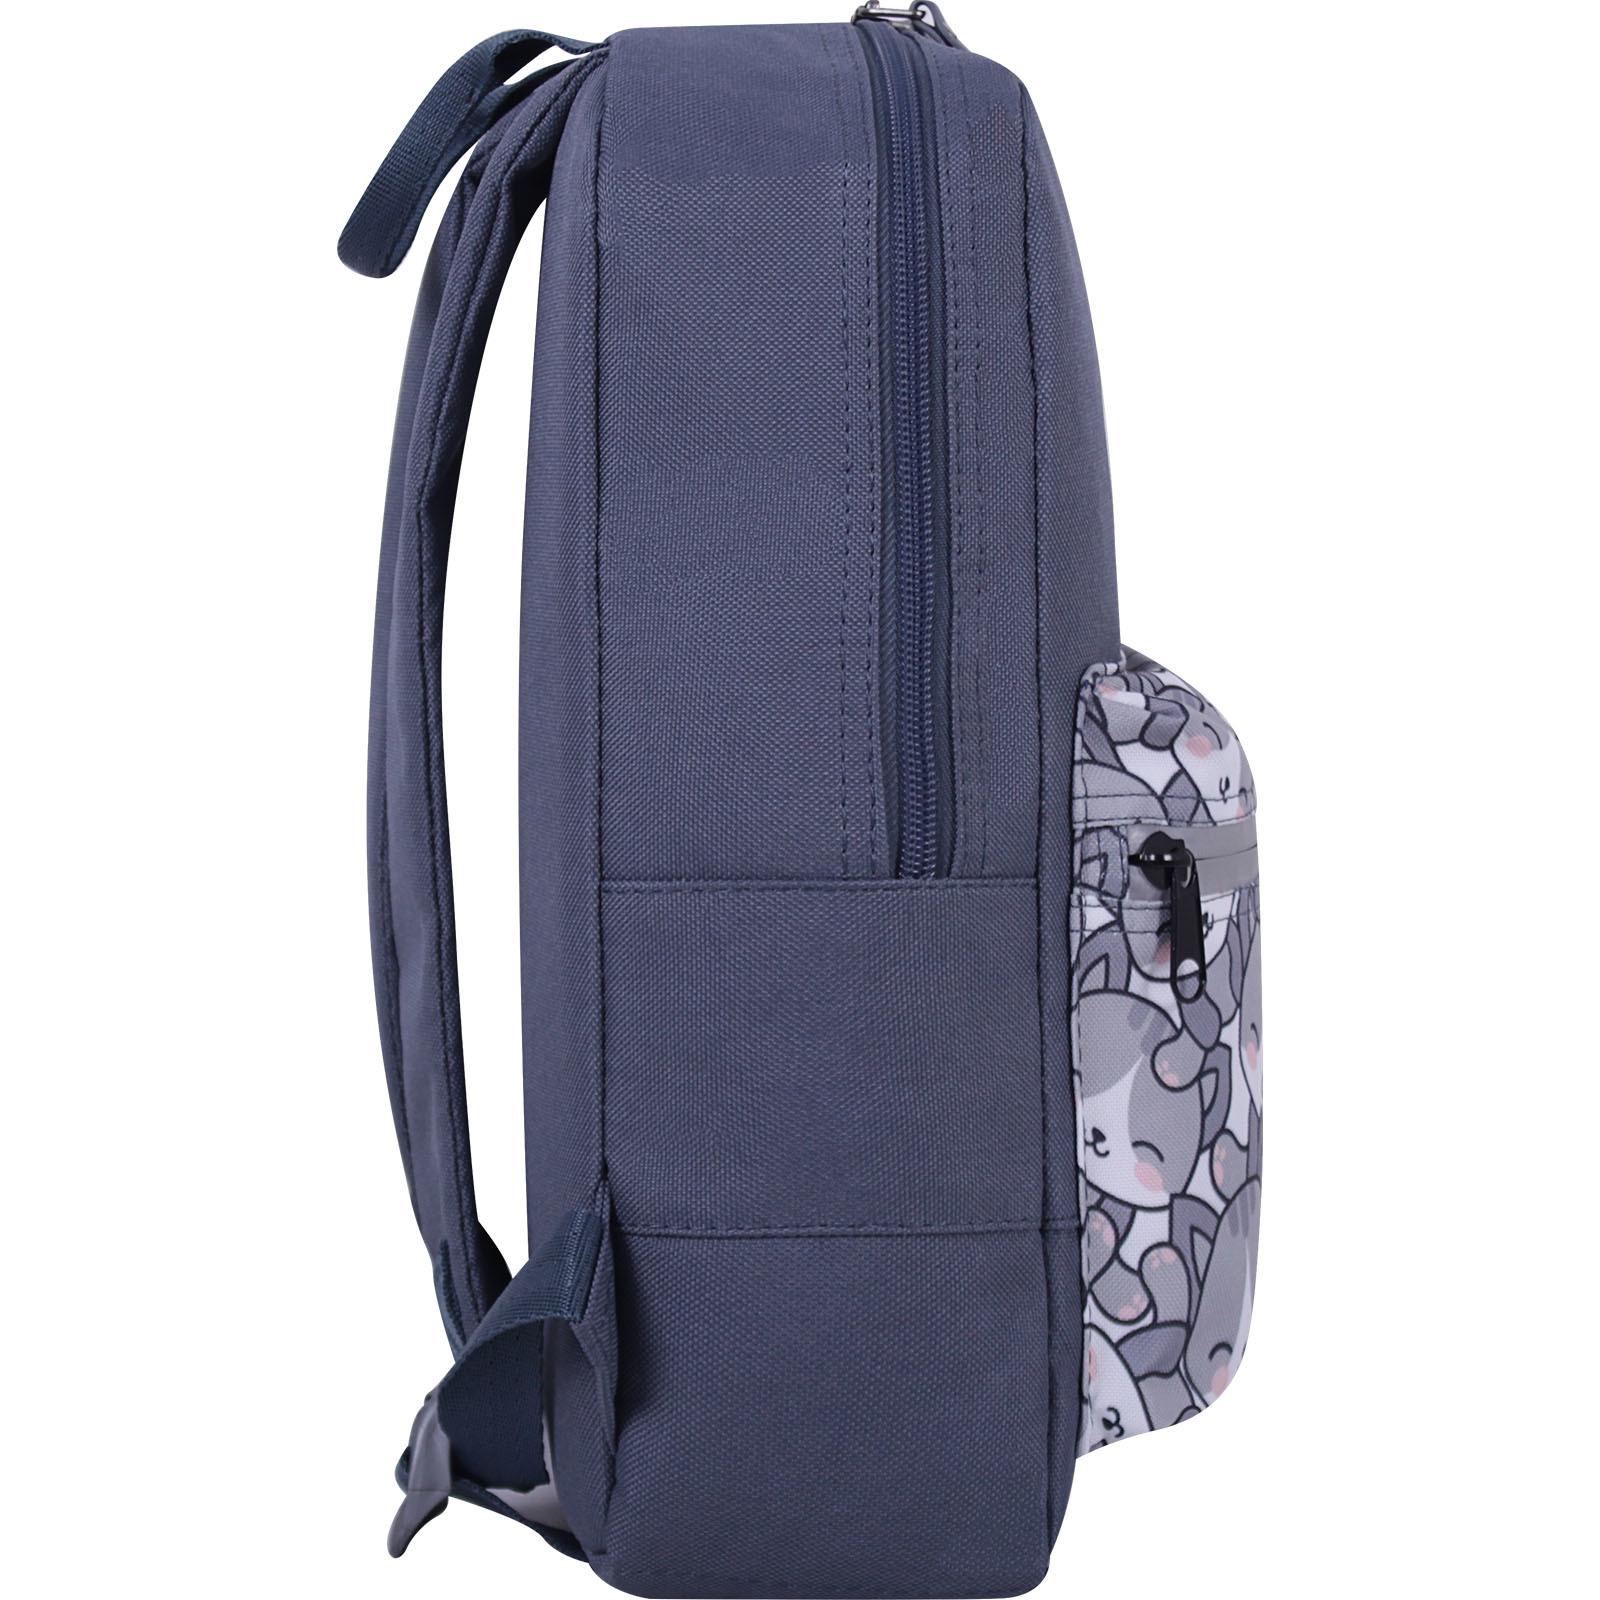 Рюкзак Bagland Молодежный mini 8 л. серый 756 (0050866) фото 2